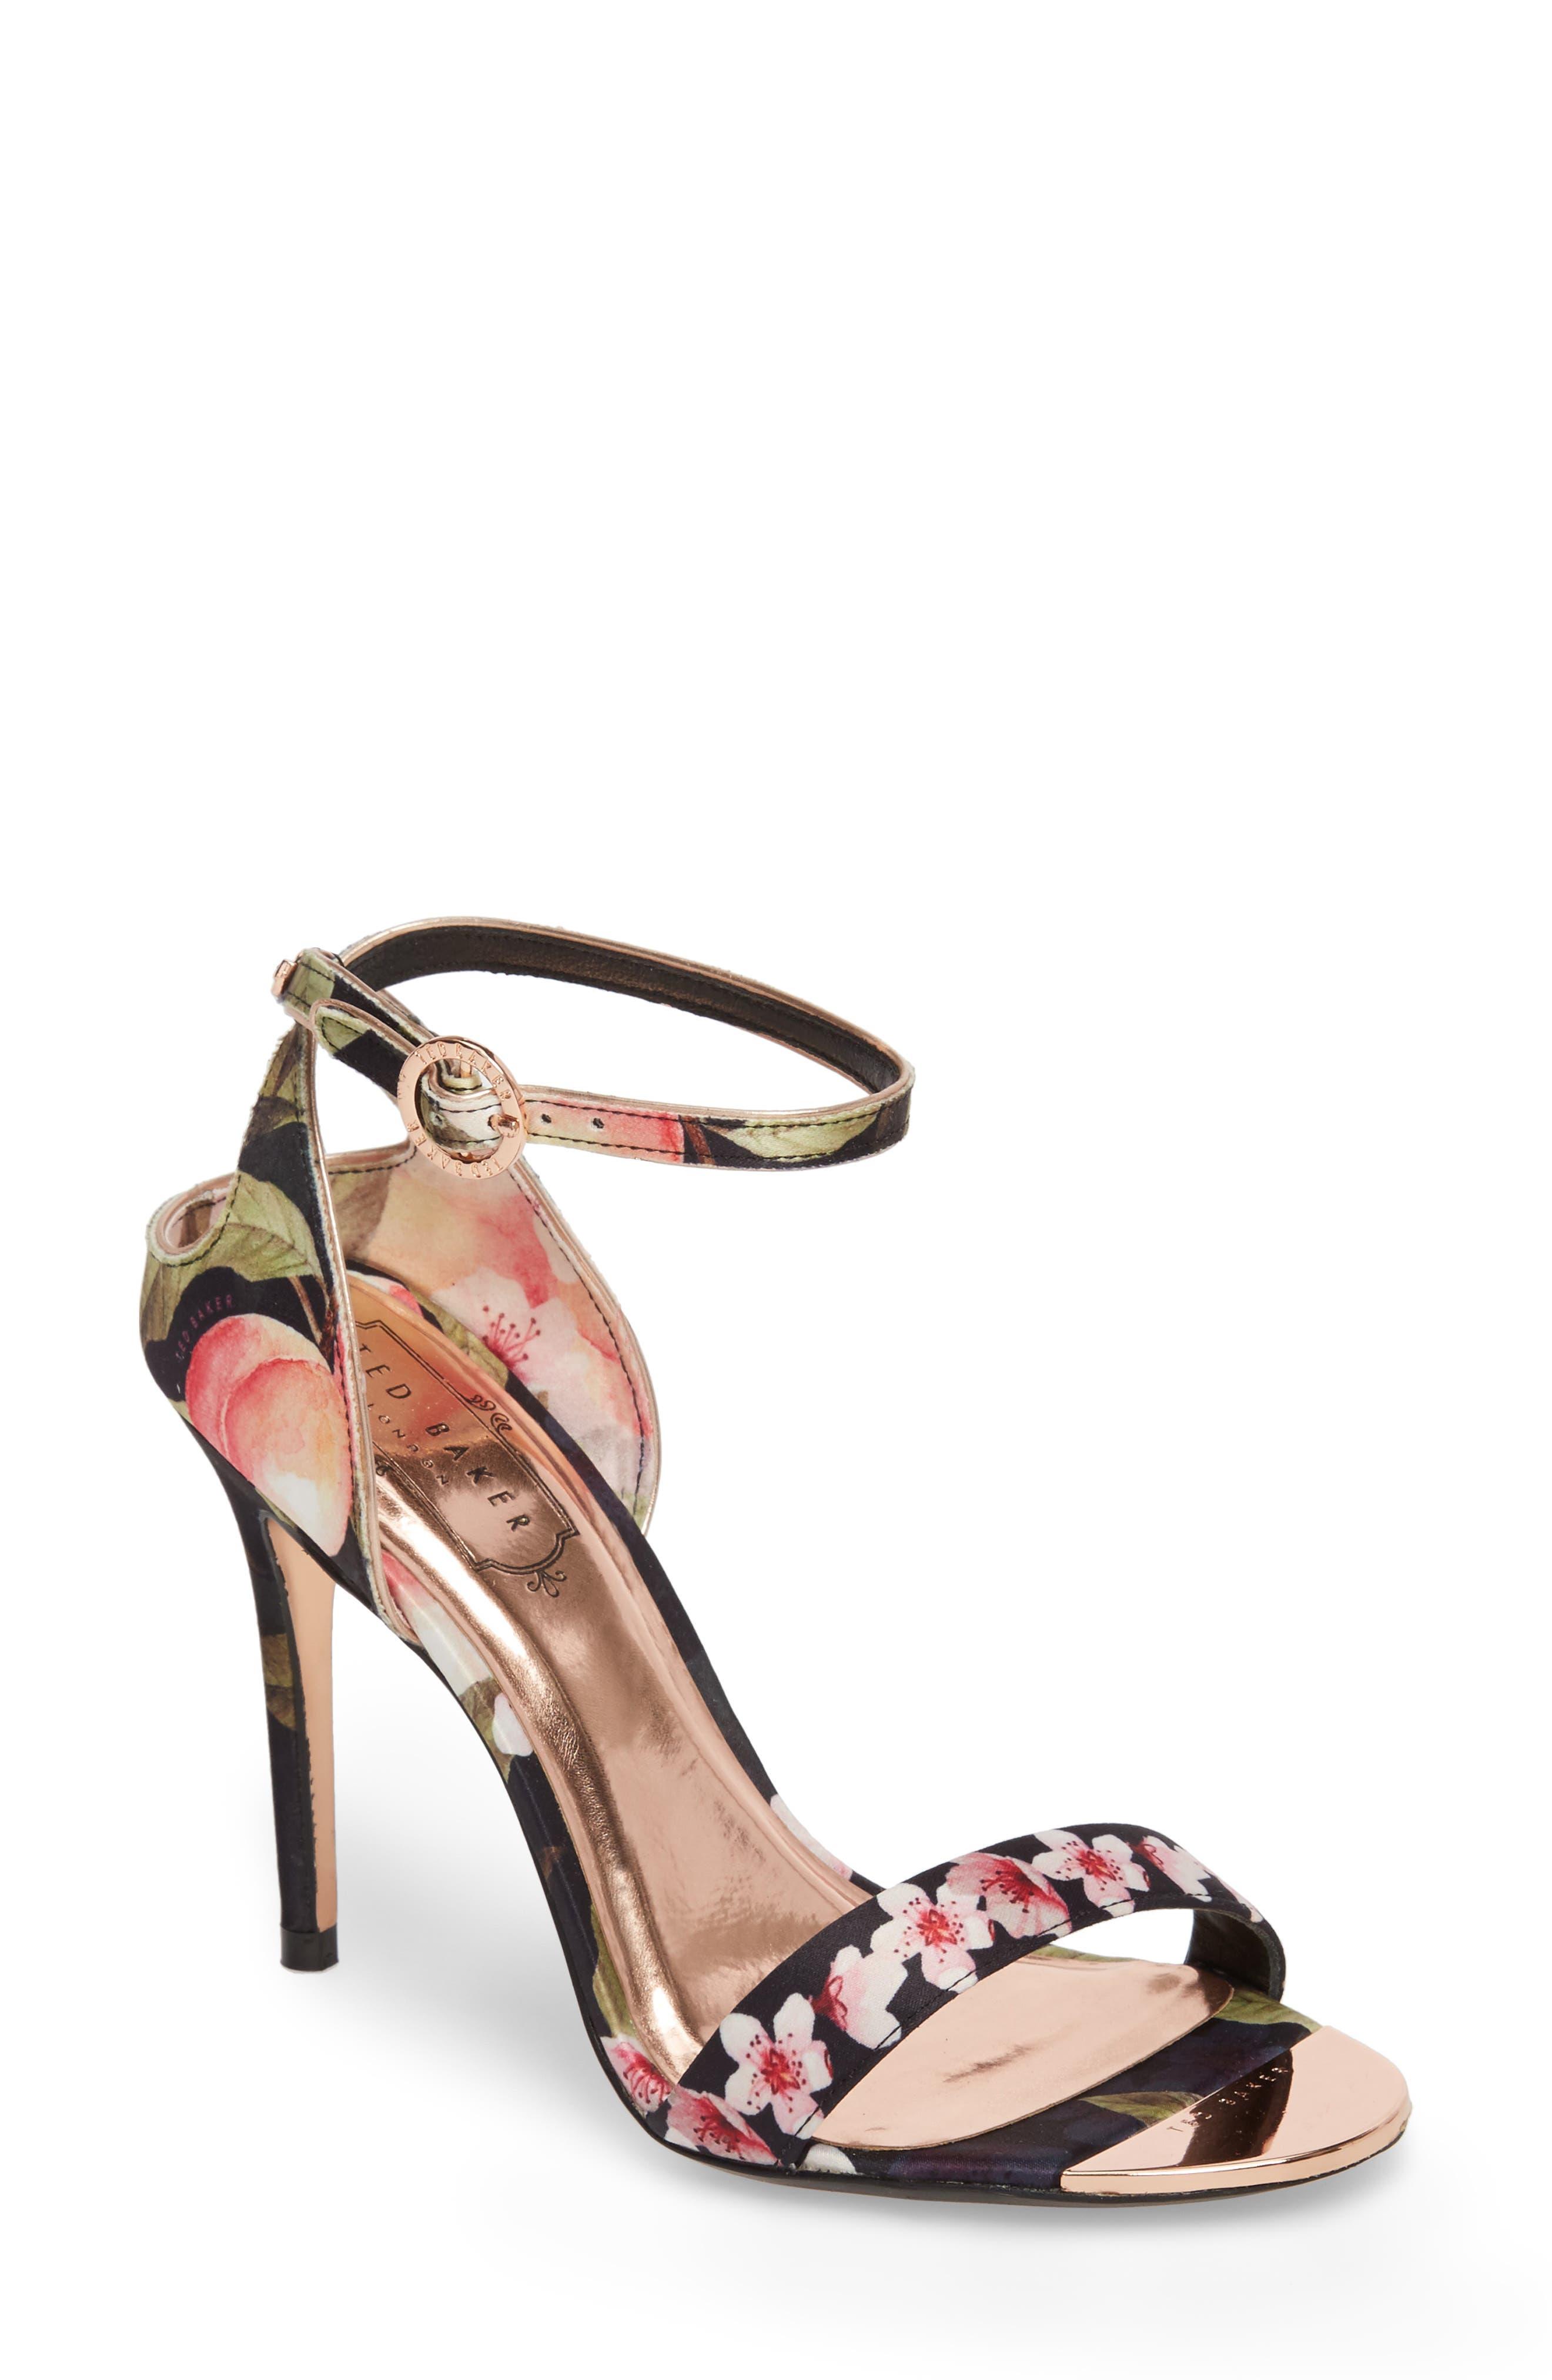 Mirobep Sandal,                         Main,                         color, Peach Blossom Black Satin